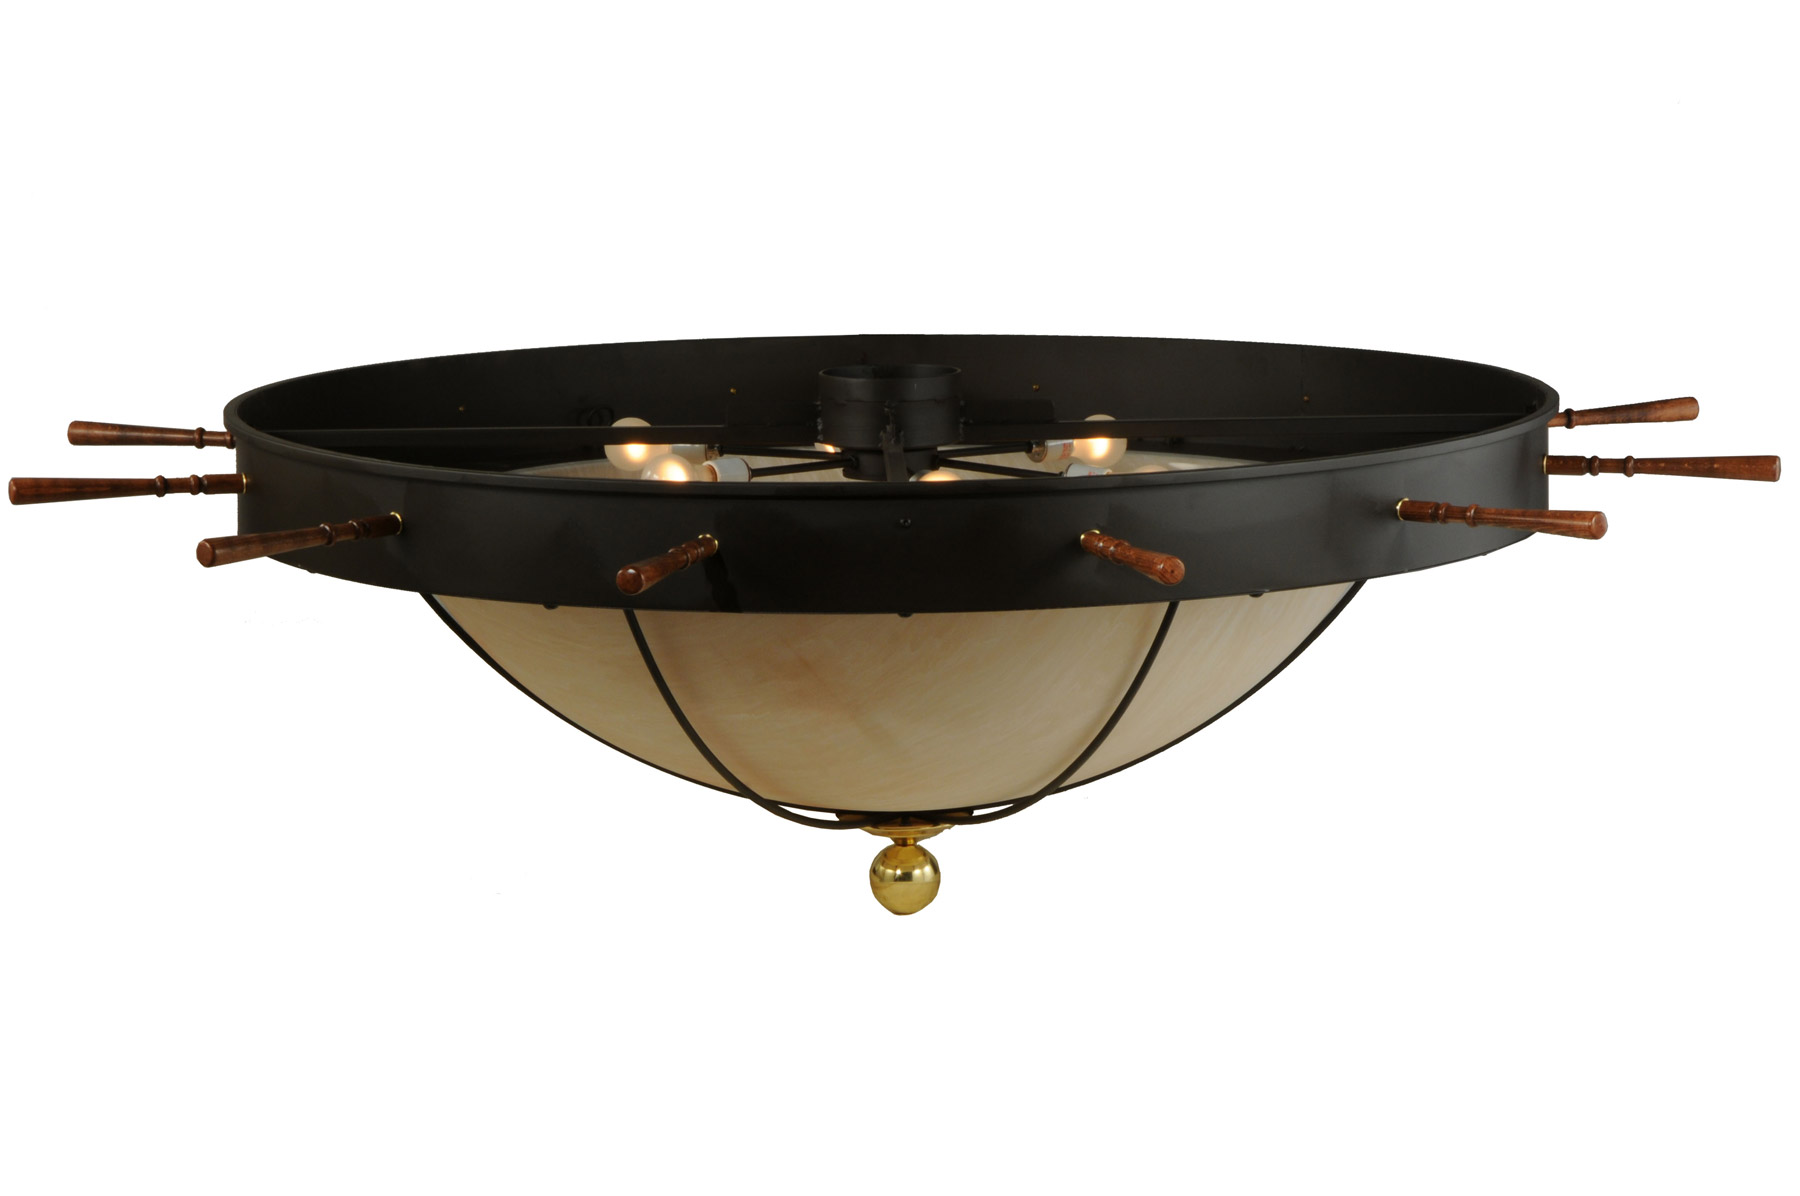 nautical flush mount ceiling fixture meyda 140743. Black Bedroom Furniture Sets. Home Design Ideas